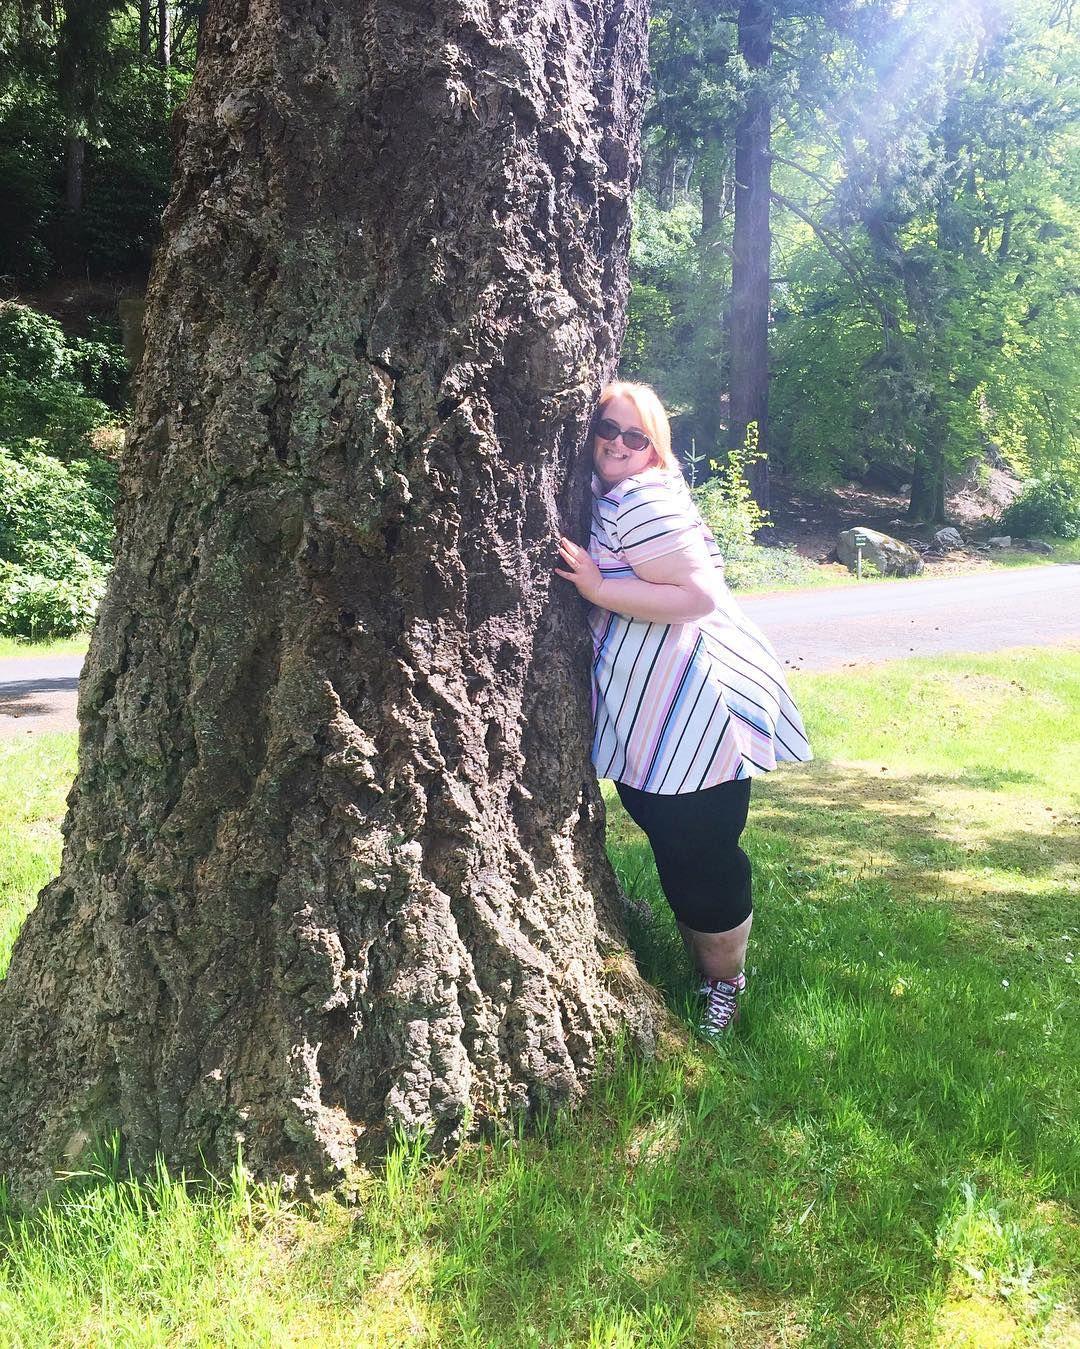 Sometimes, you just gotta hug a tree! 🌳☀️